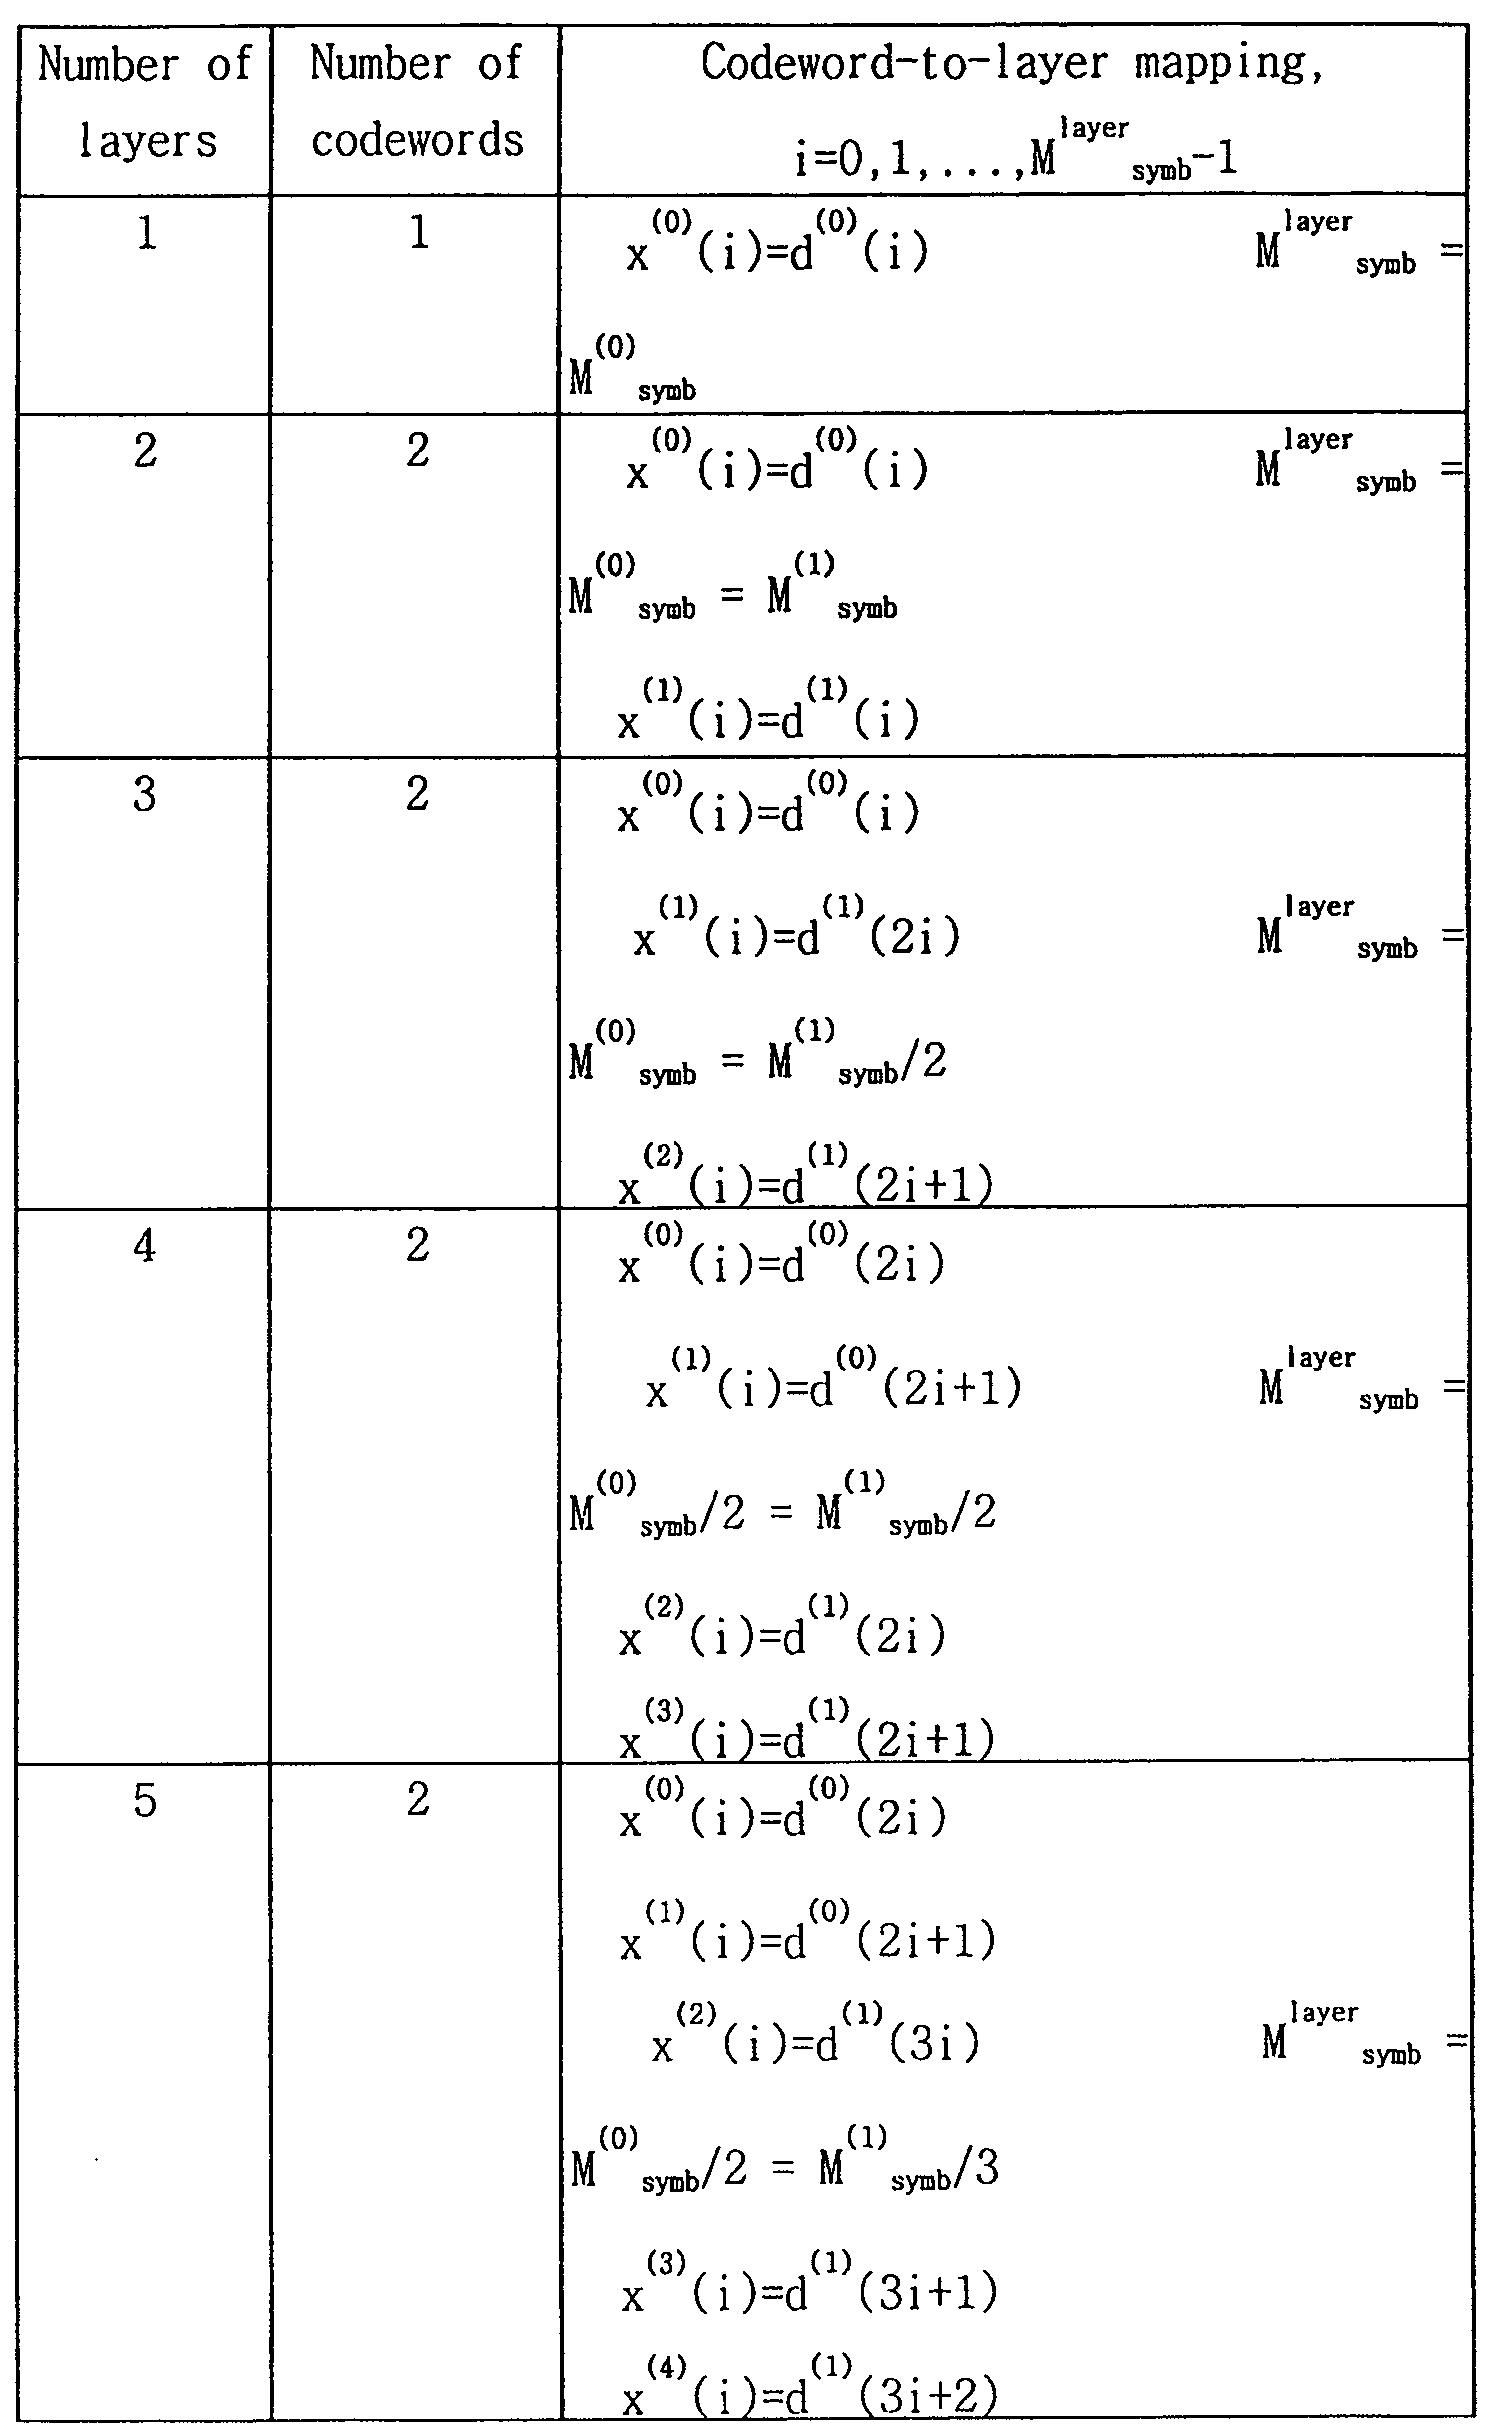 Figure WO-DOC-TABLE-42